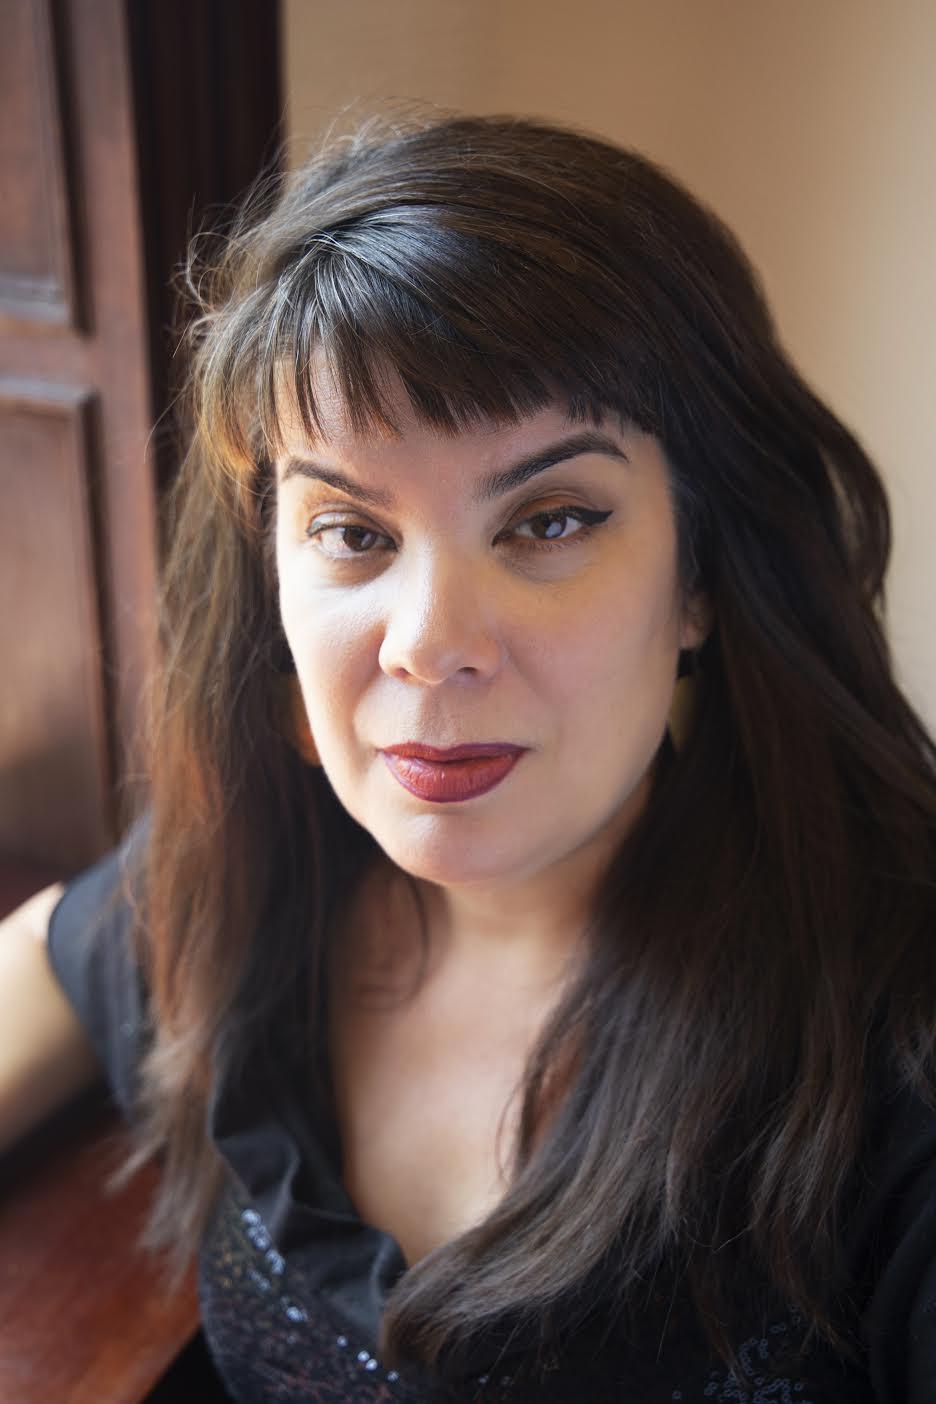 Lara photo by Renee Rogoff